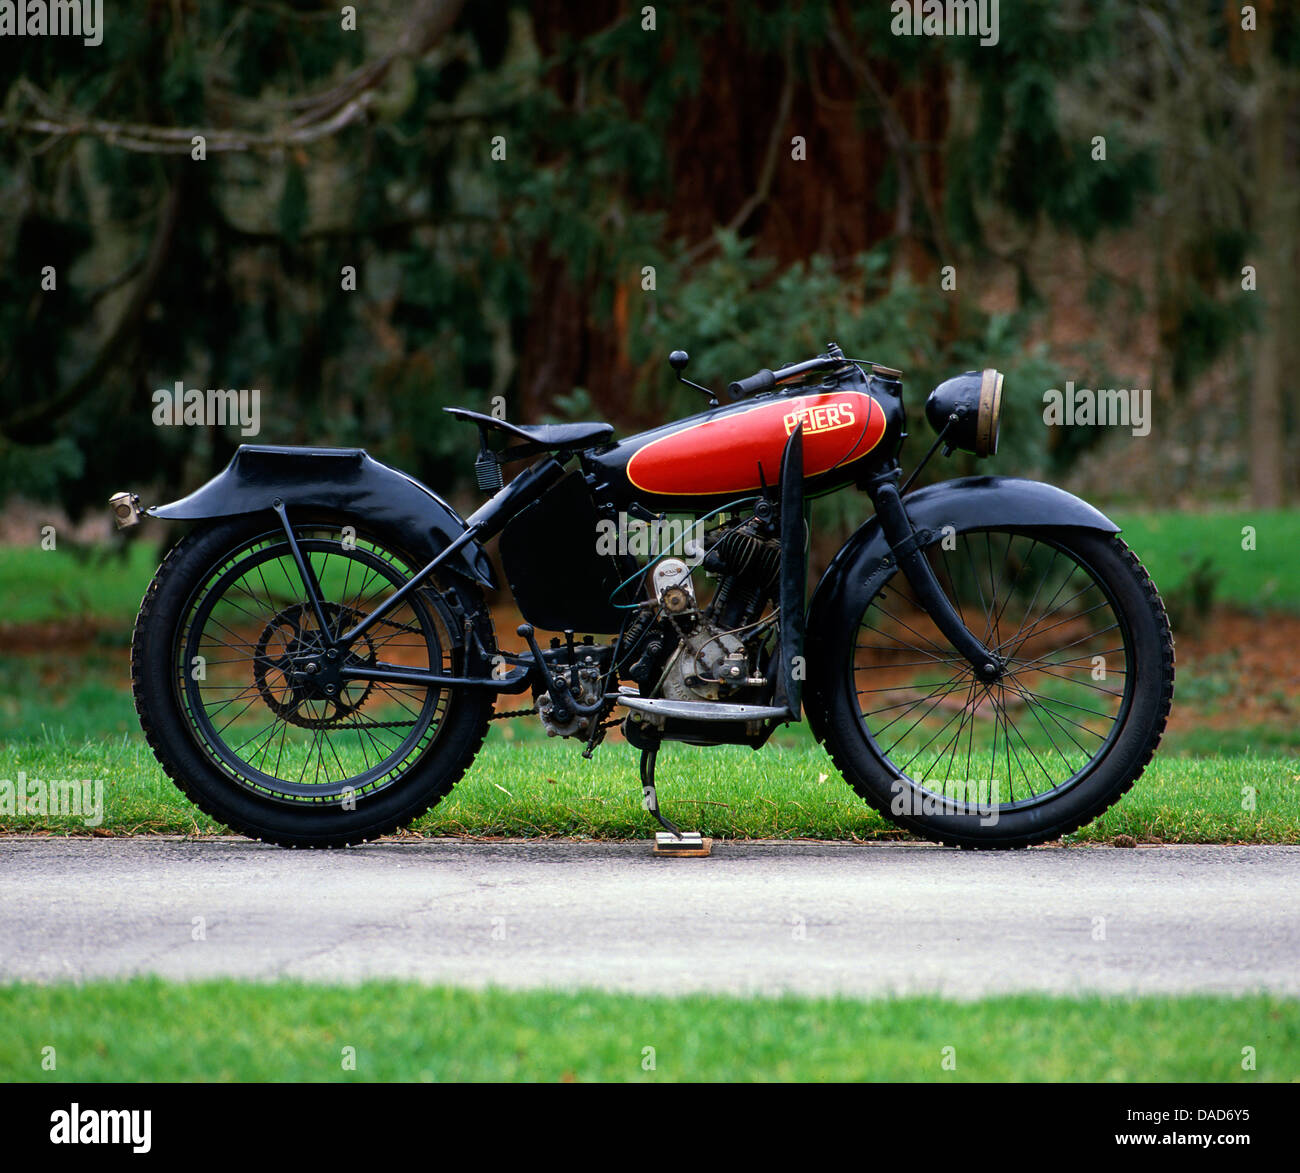 1920 Peters 2 3/4 hp motorcycle - Stock Image